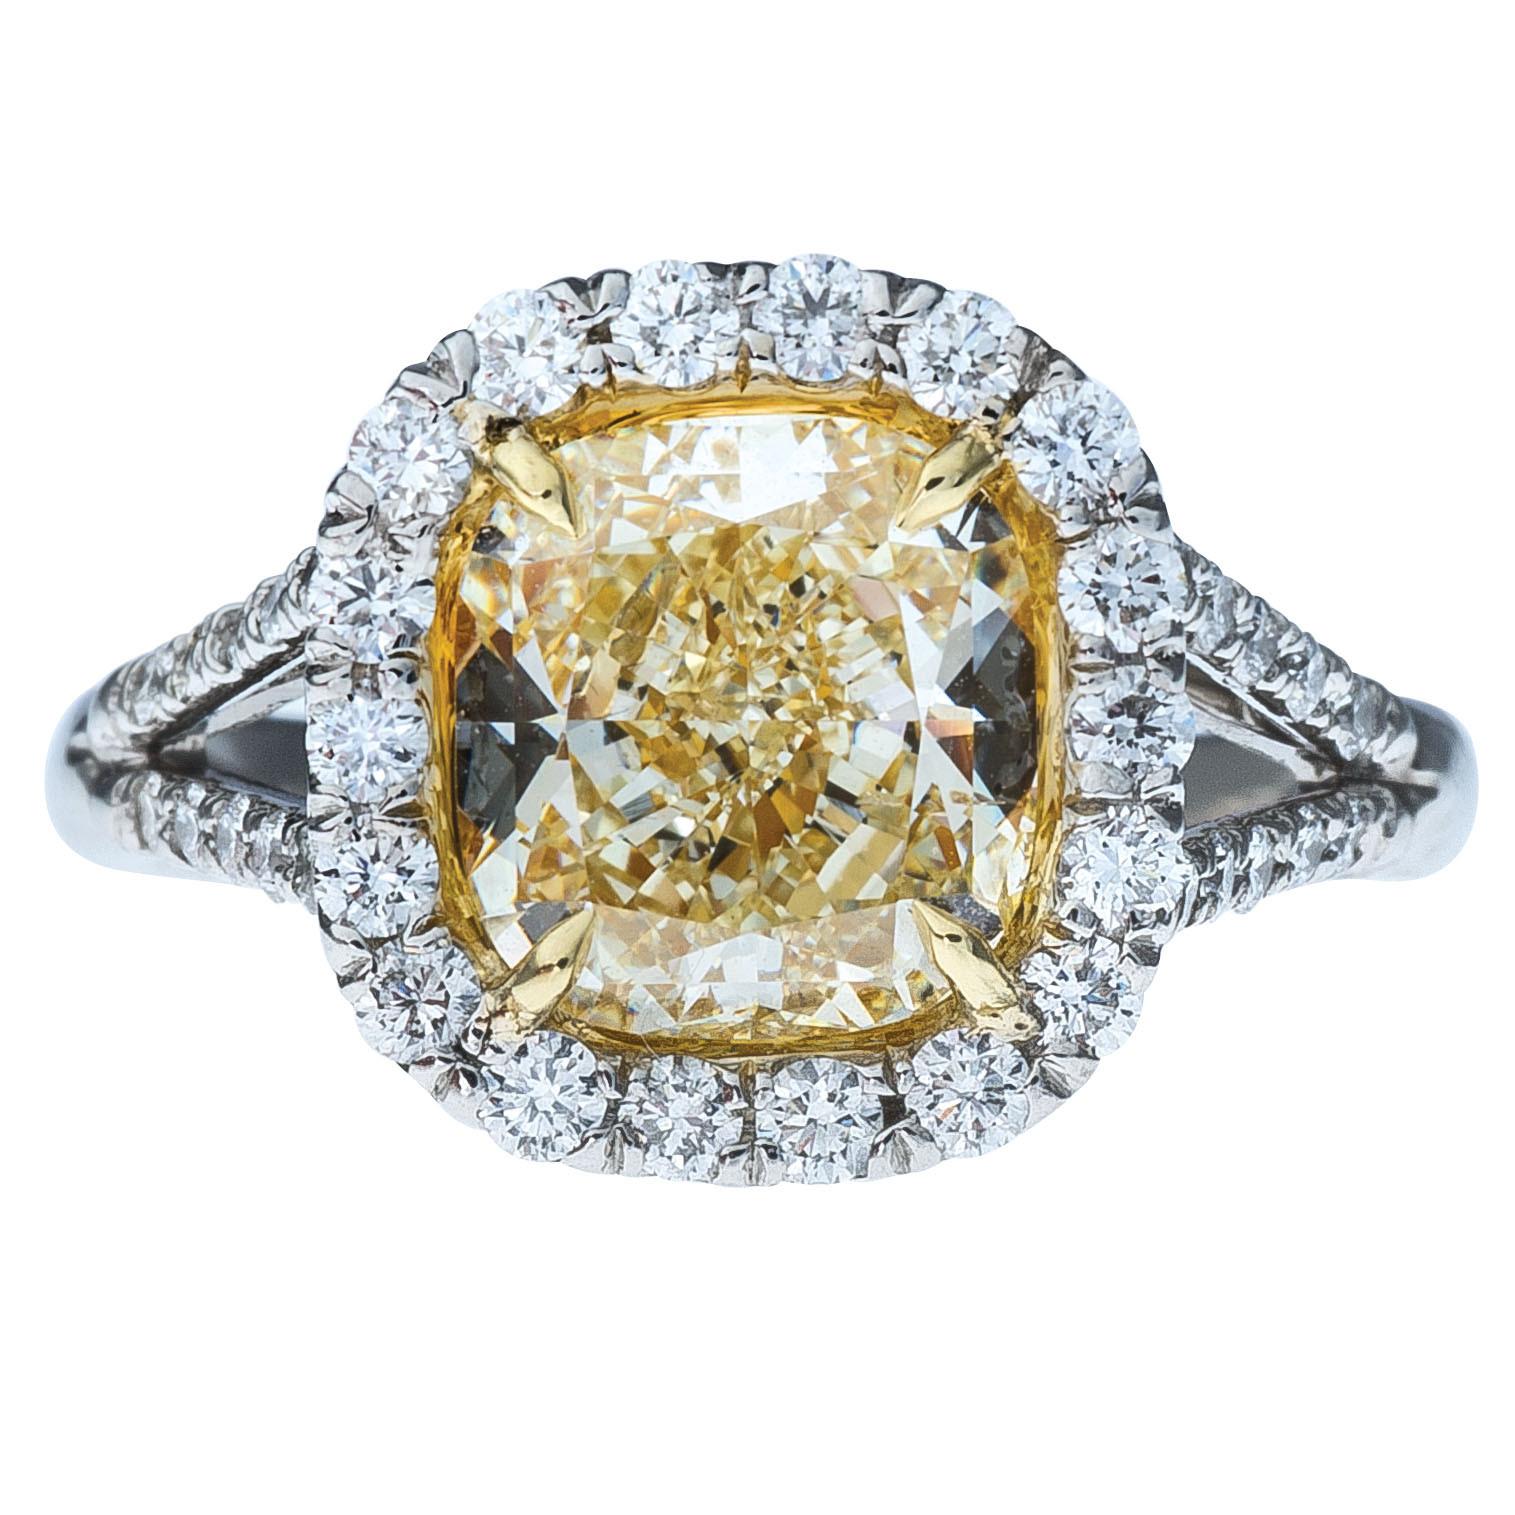 Vintage 3.61 CTW Diamond Engagement Ring